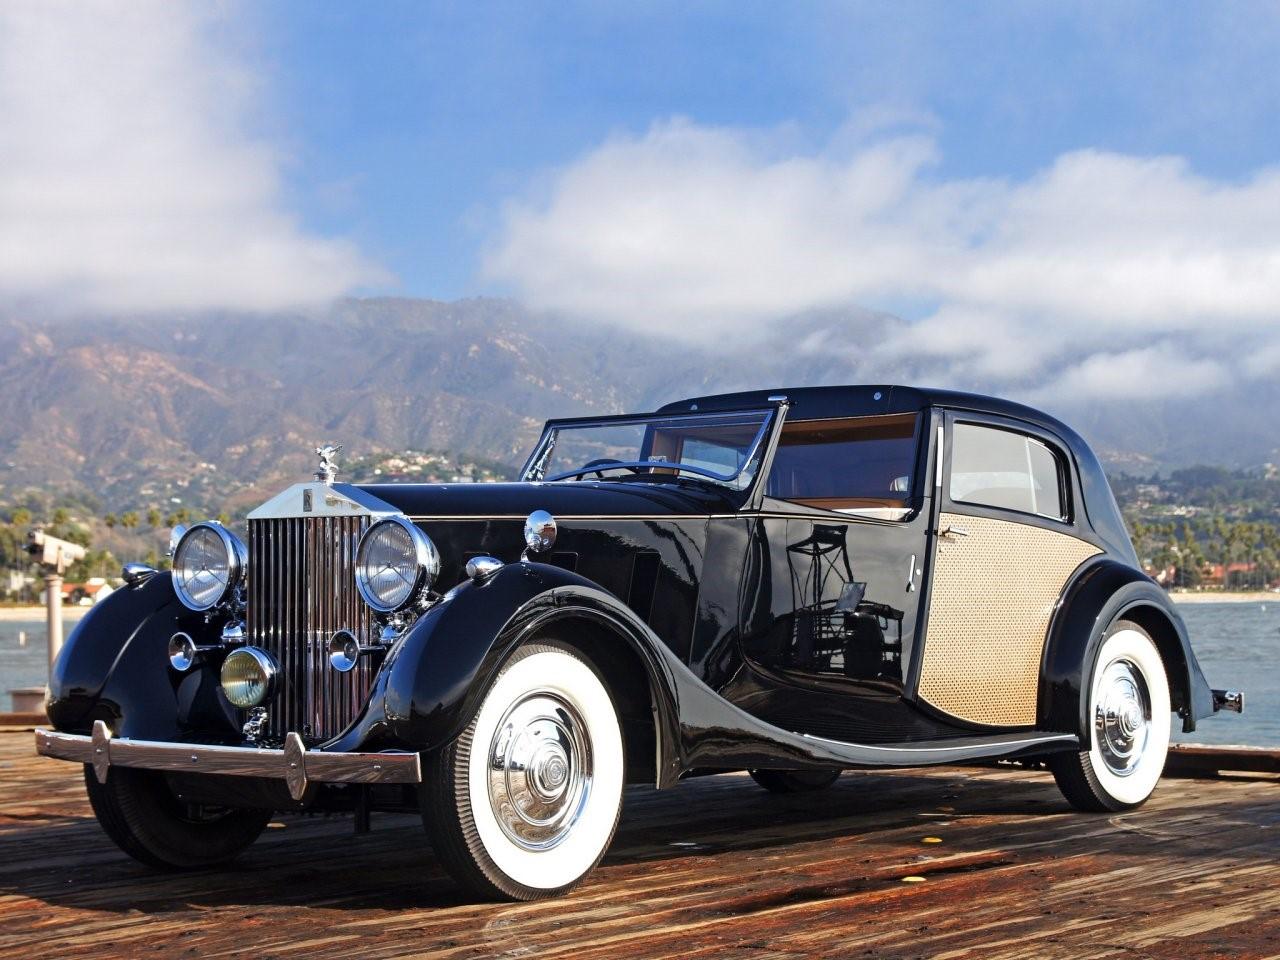 1938 Rolls Royce Phantom III Sedanca deVille Park Ward 2